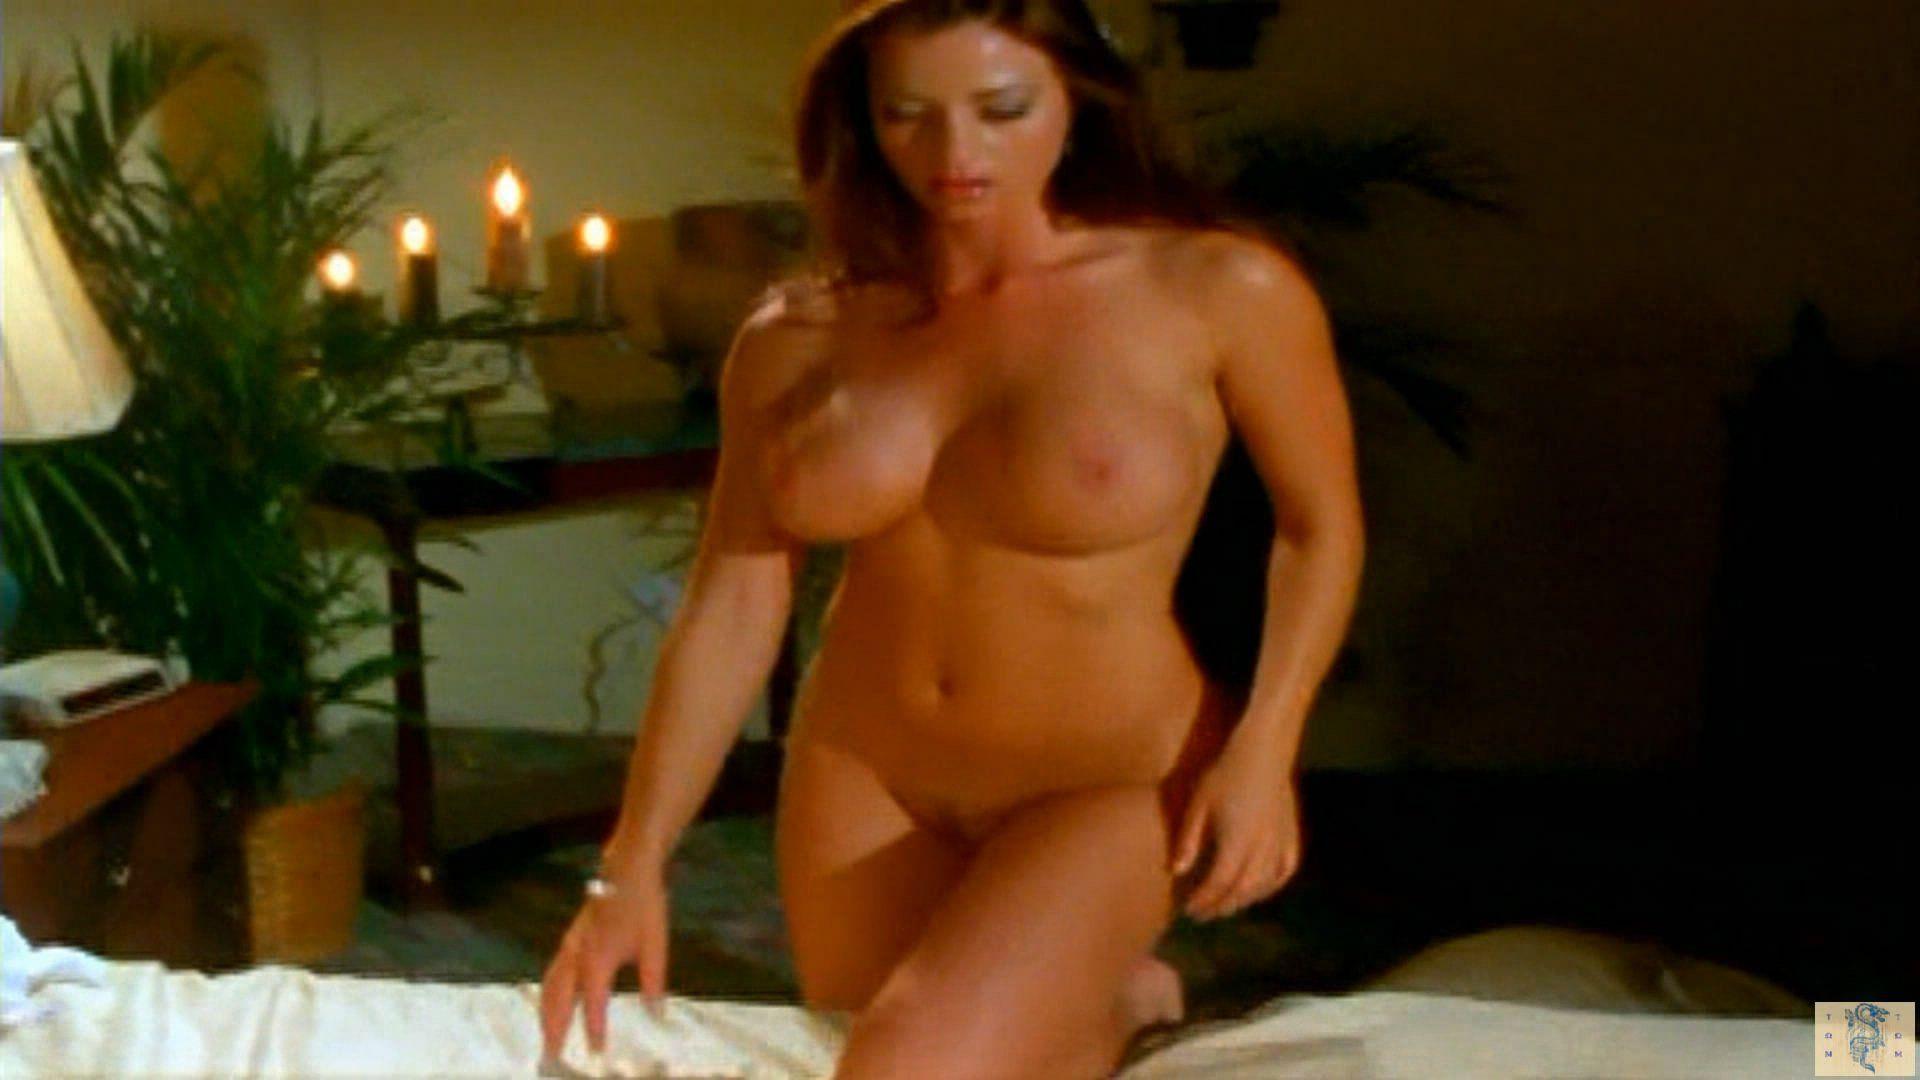 Hot fucking girl photo